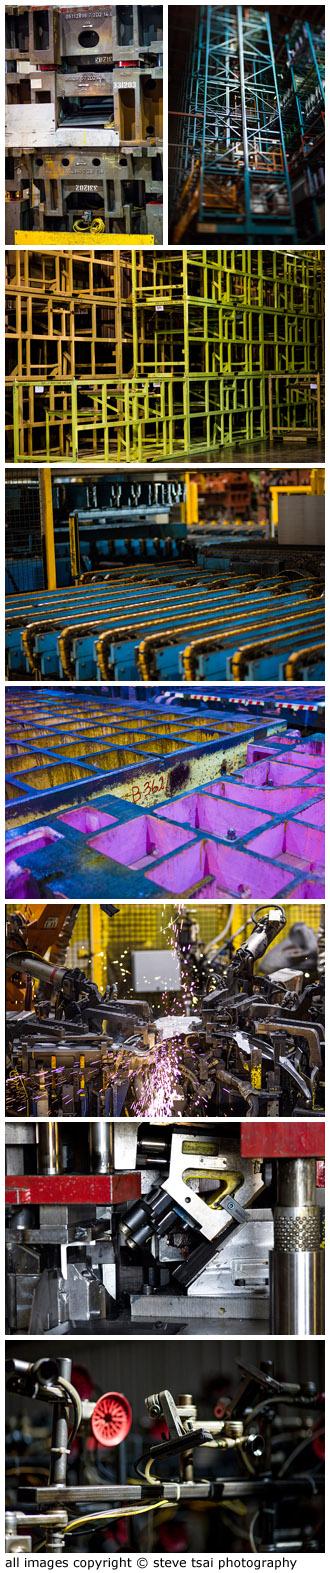 auto-manufacturing plant